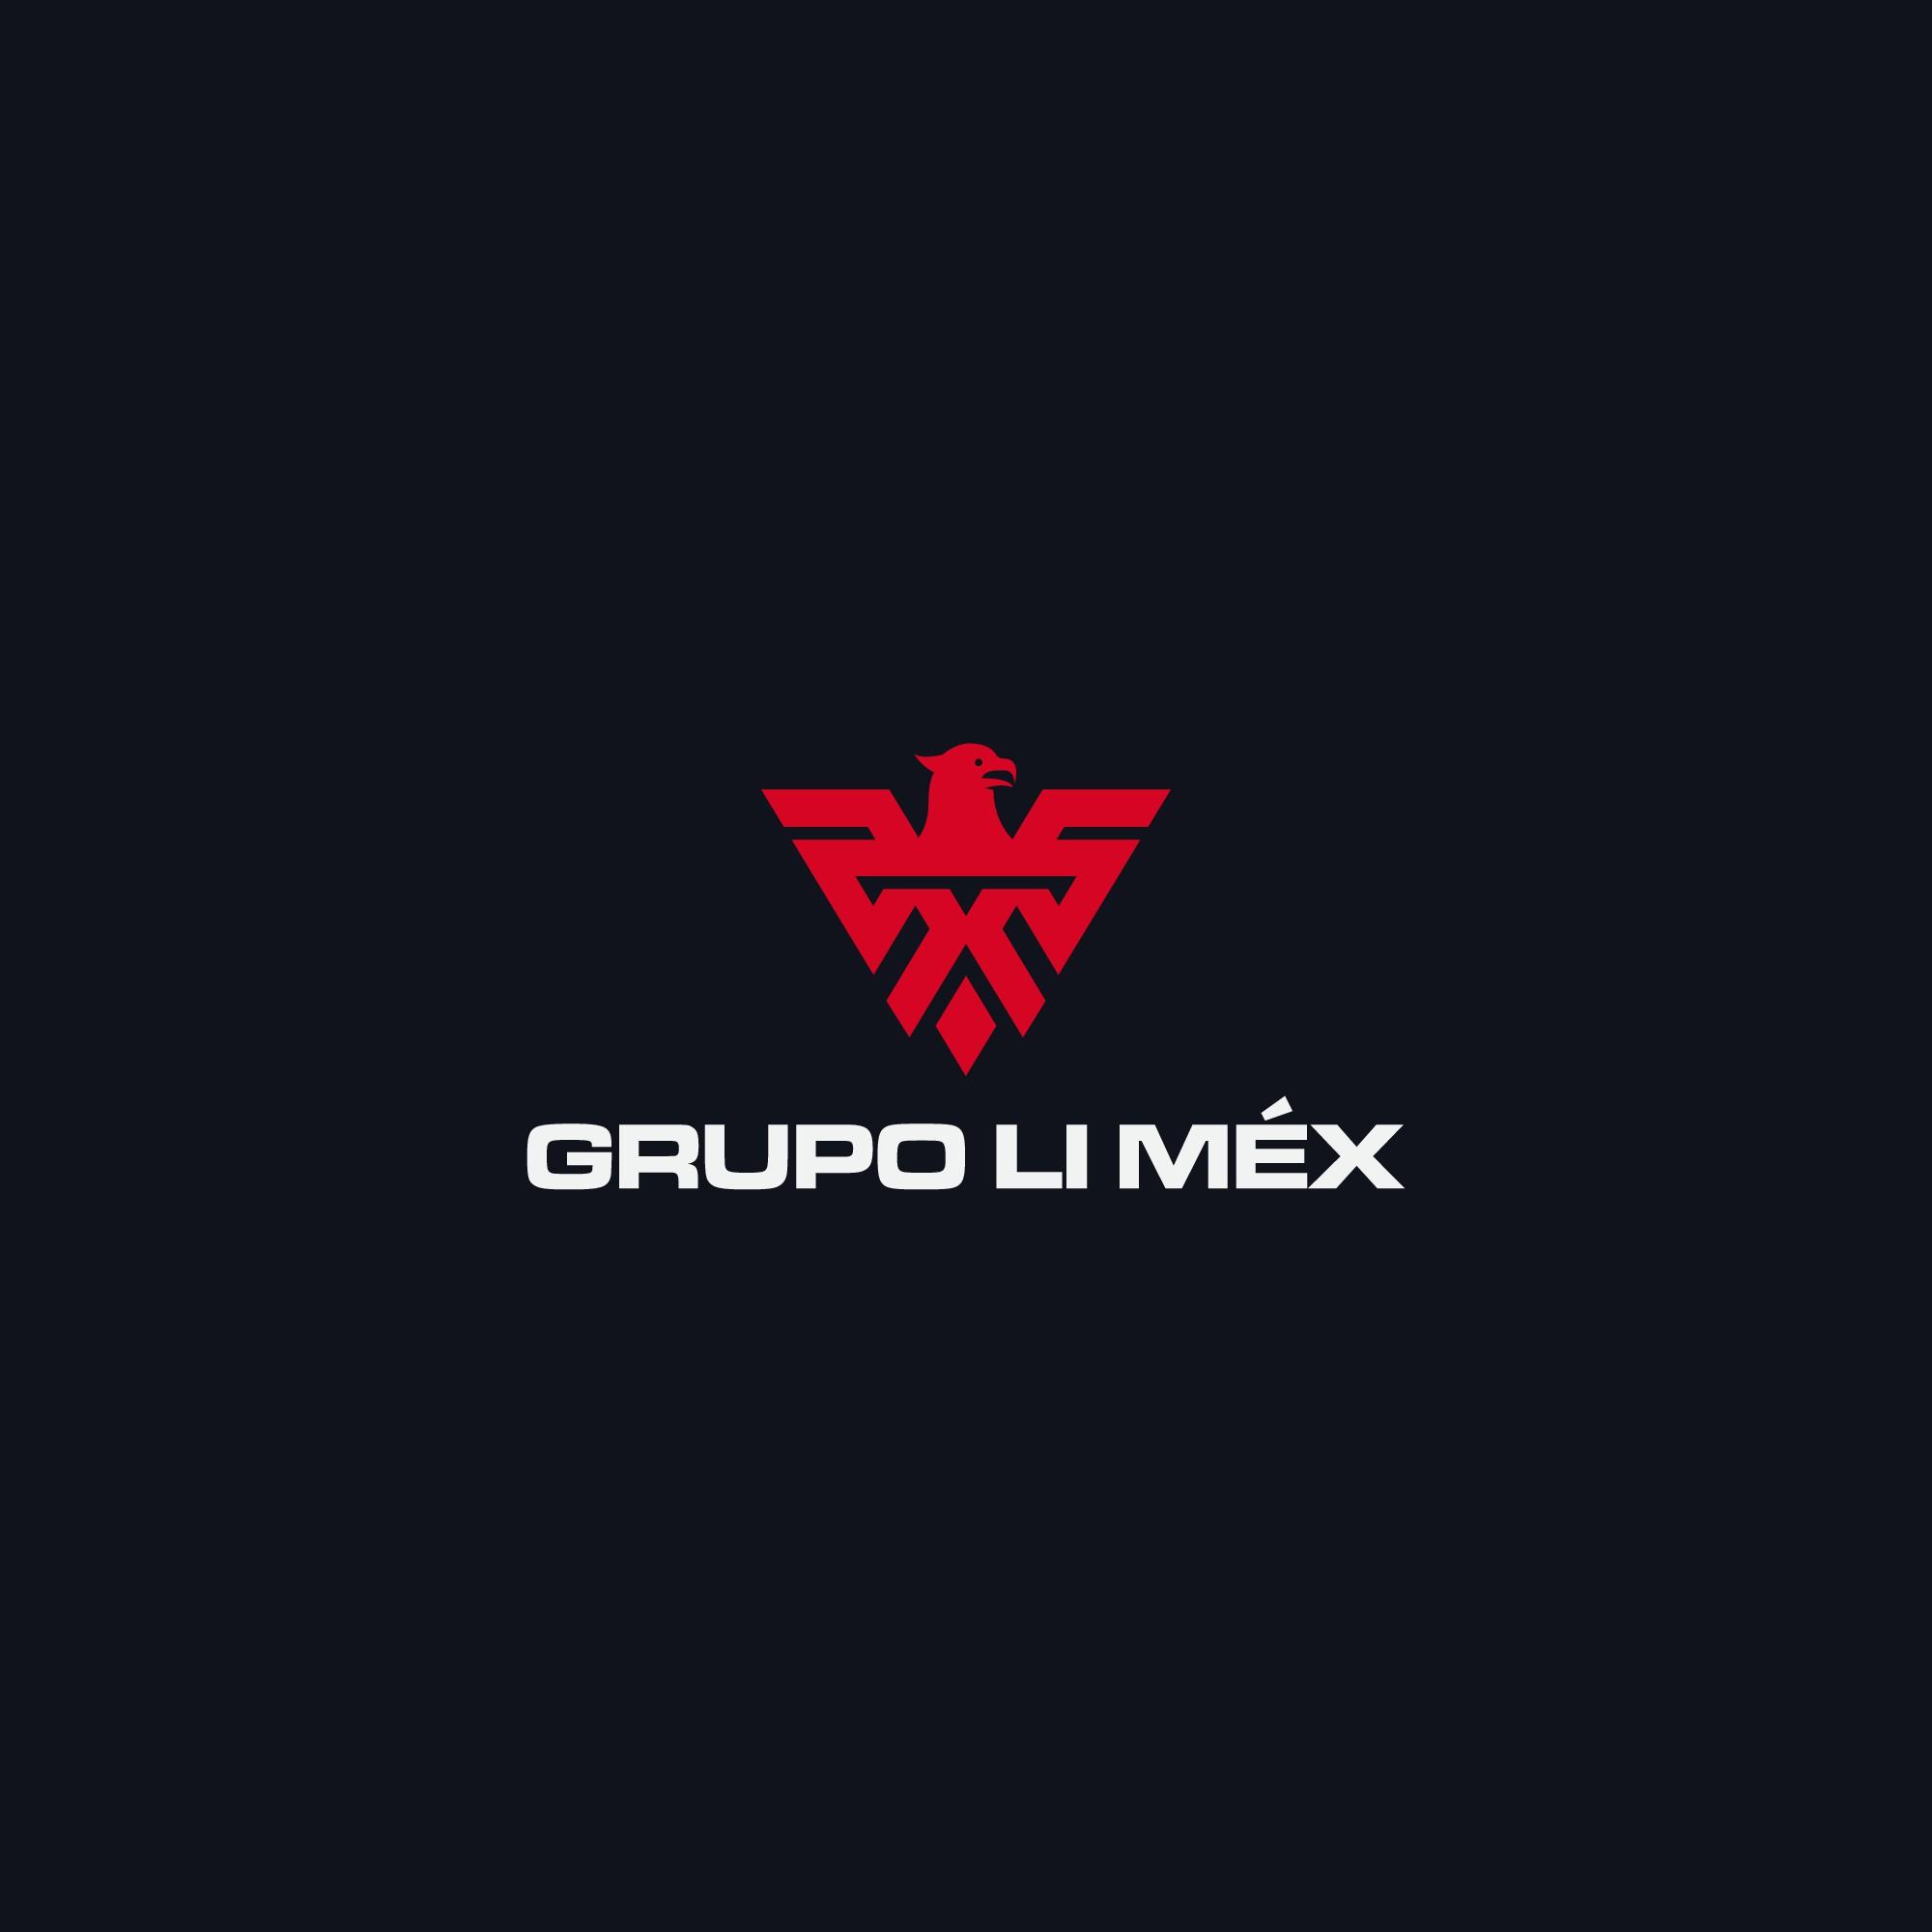 Logo designe for a Mexican construction company